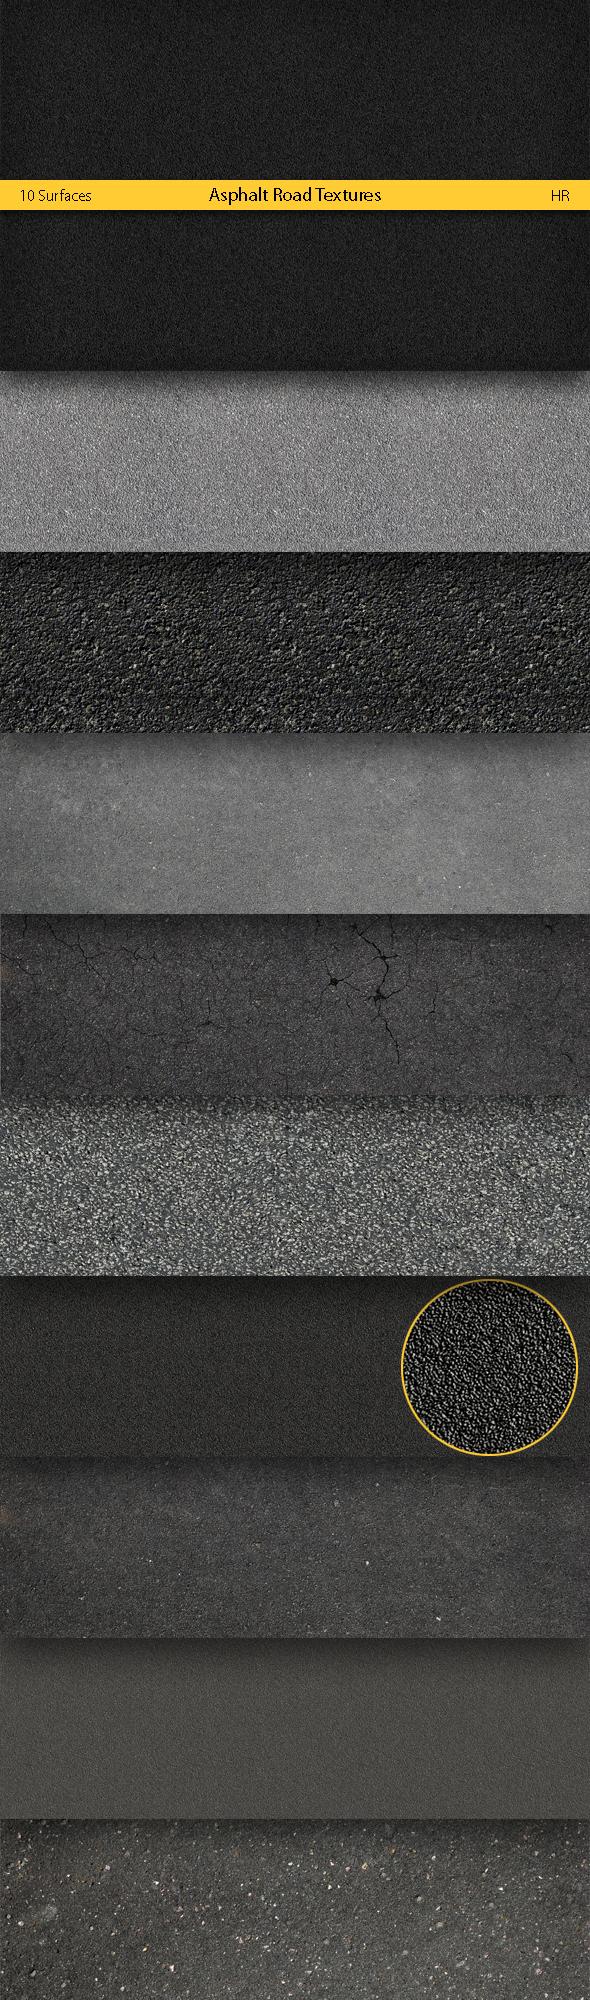 Asphalt Road Textures